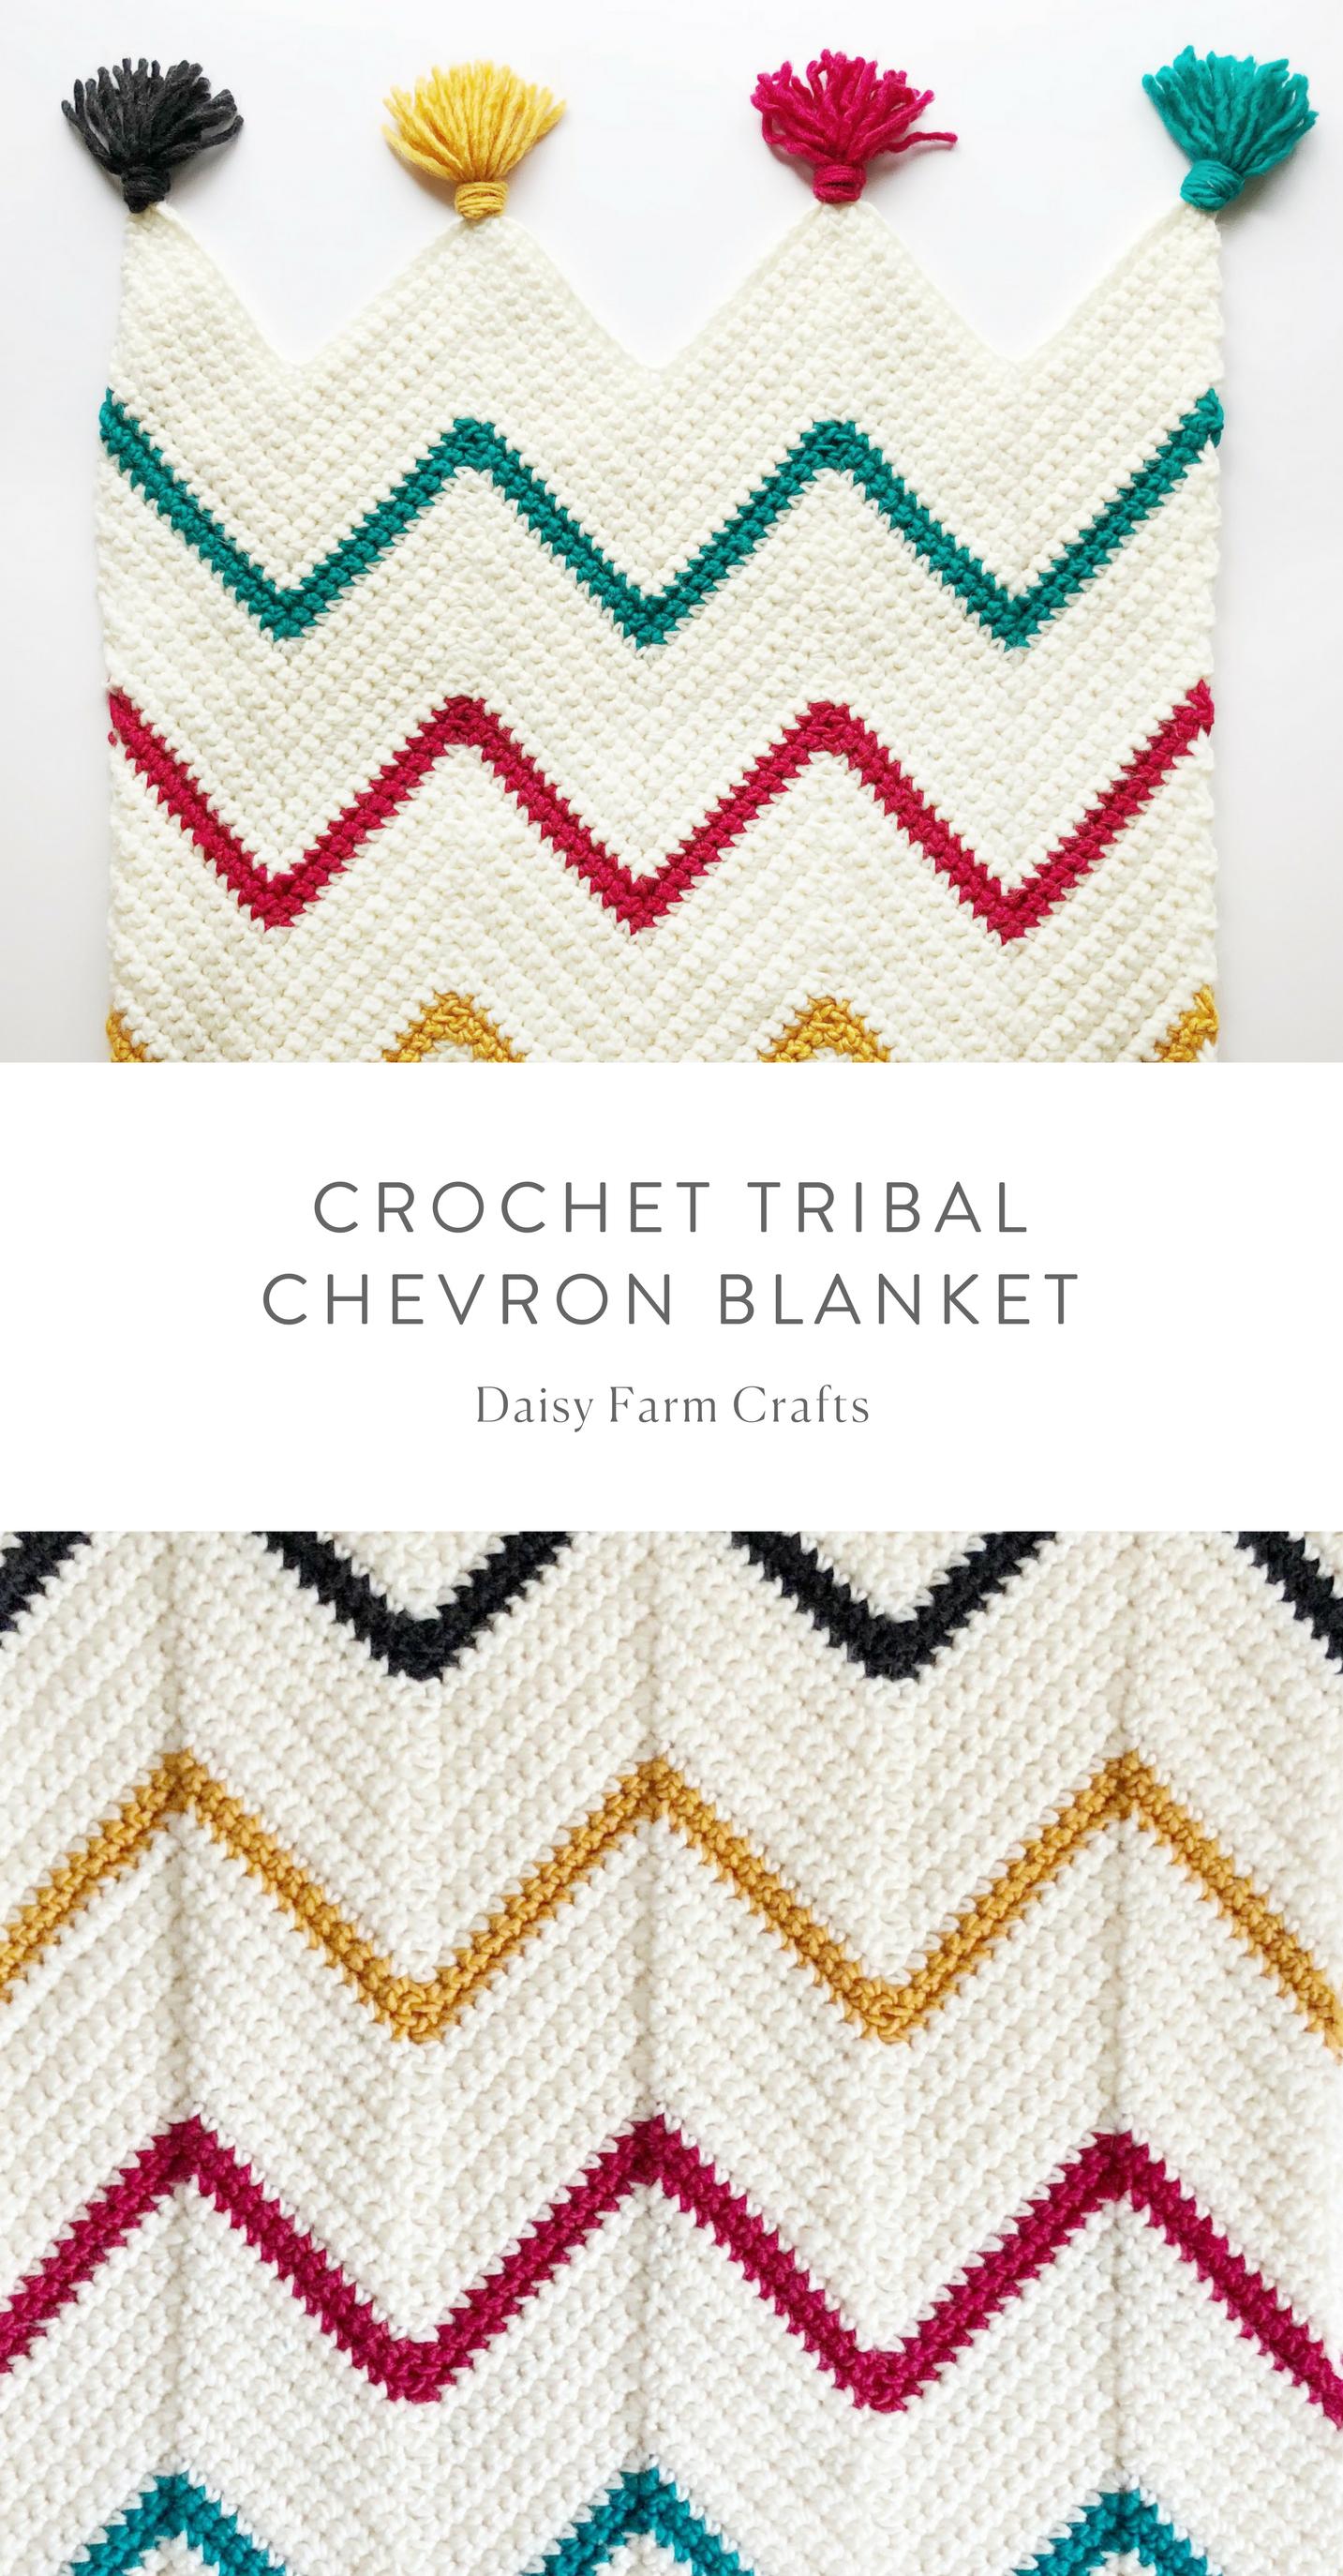 Free Pattern - Crochet Tribal Chevron Blanket | blankets | Pinterest ...